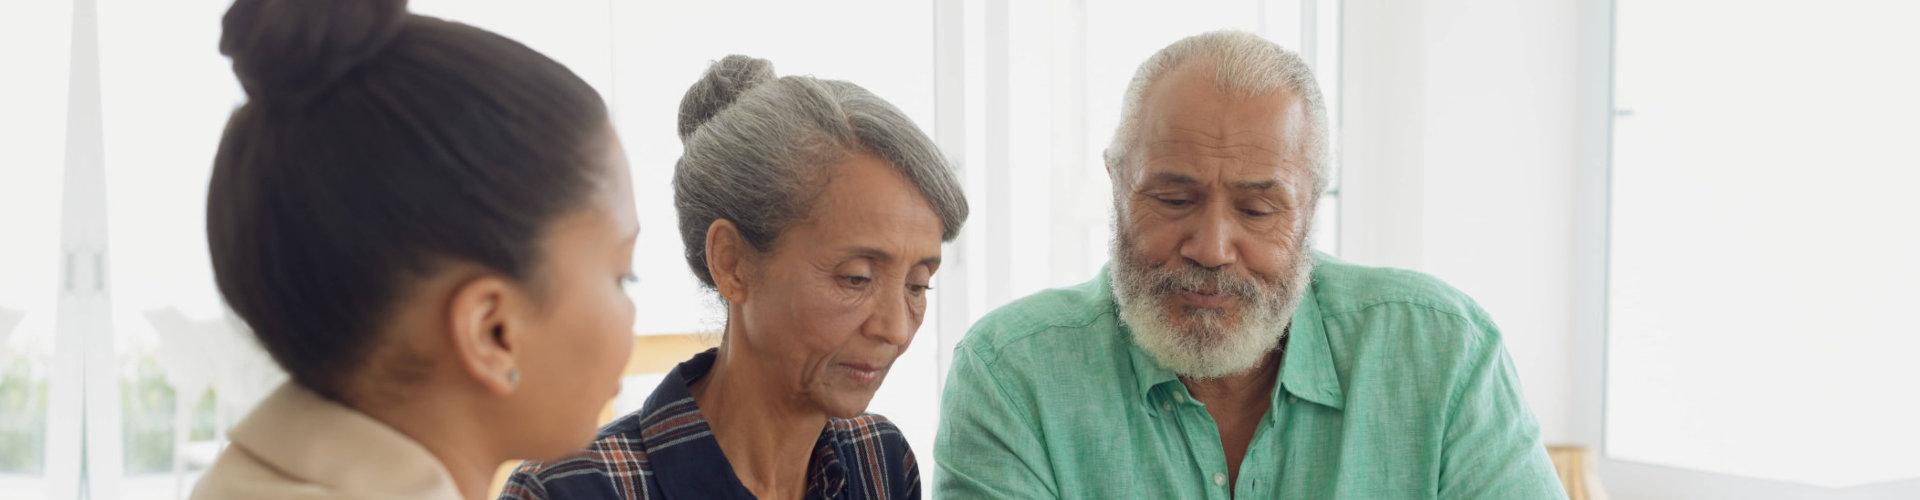 caregiver talking to a senior couple